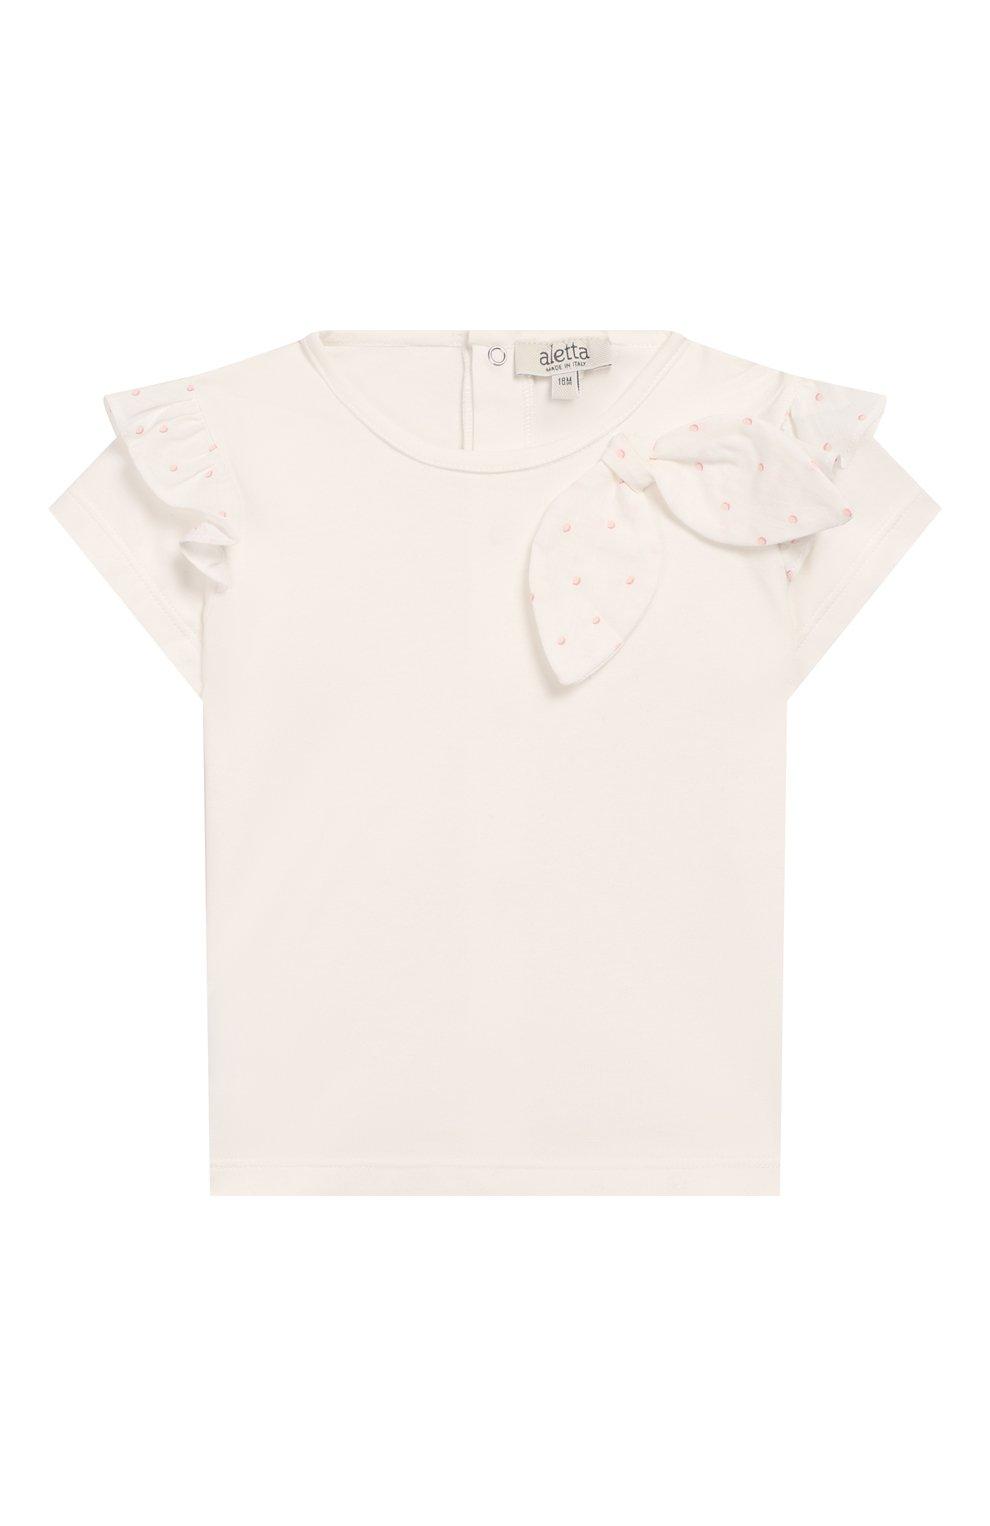 ZhuHanug Pancreatic Cancer Awareness Month Newborn Baby Short Sleeve Crew Neck T-Shirt